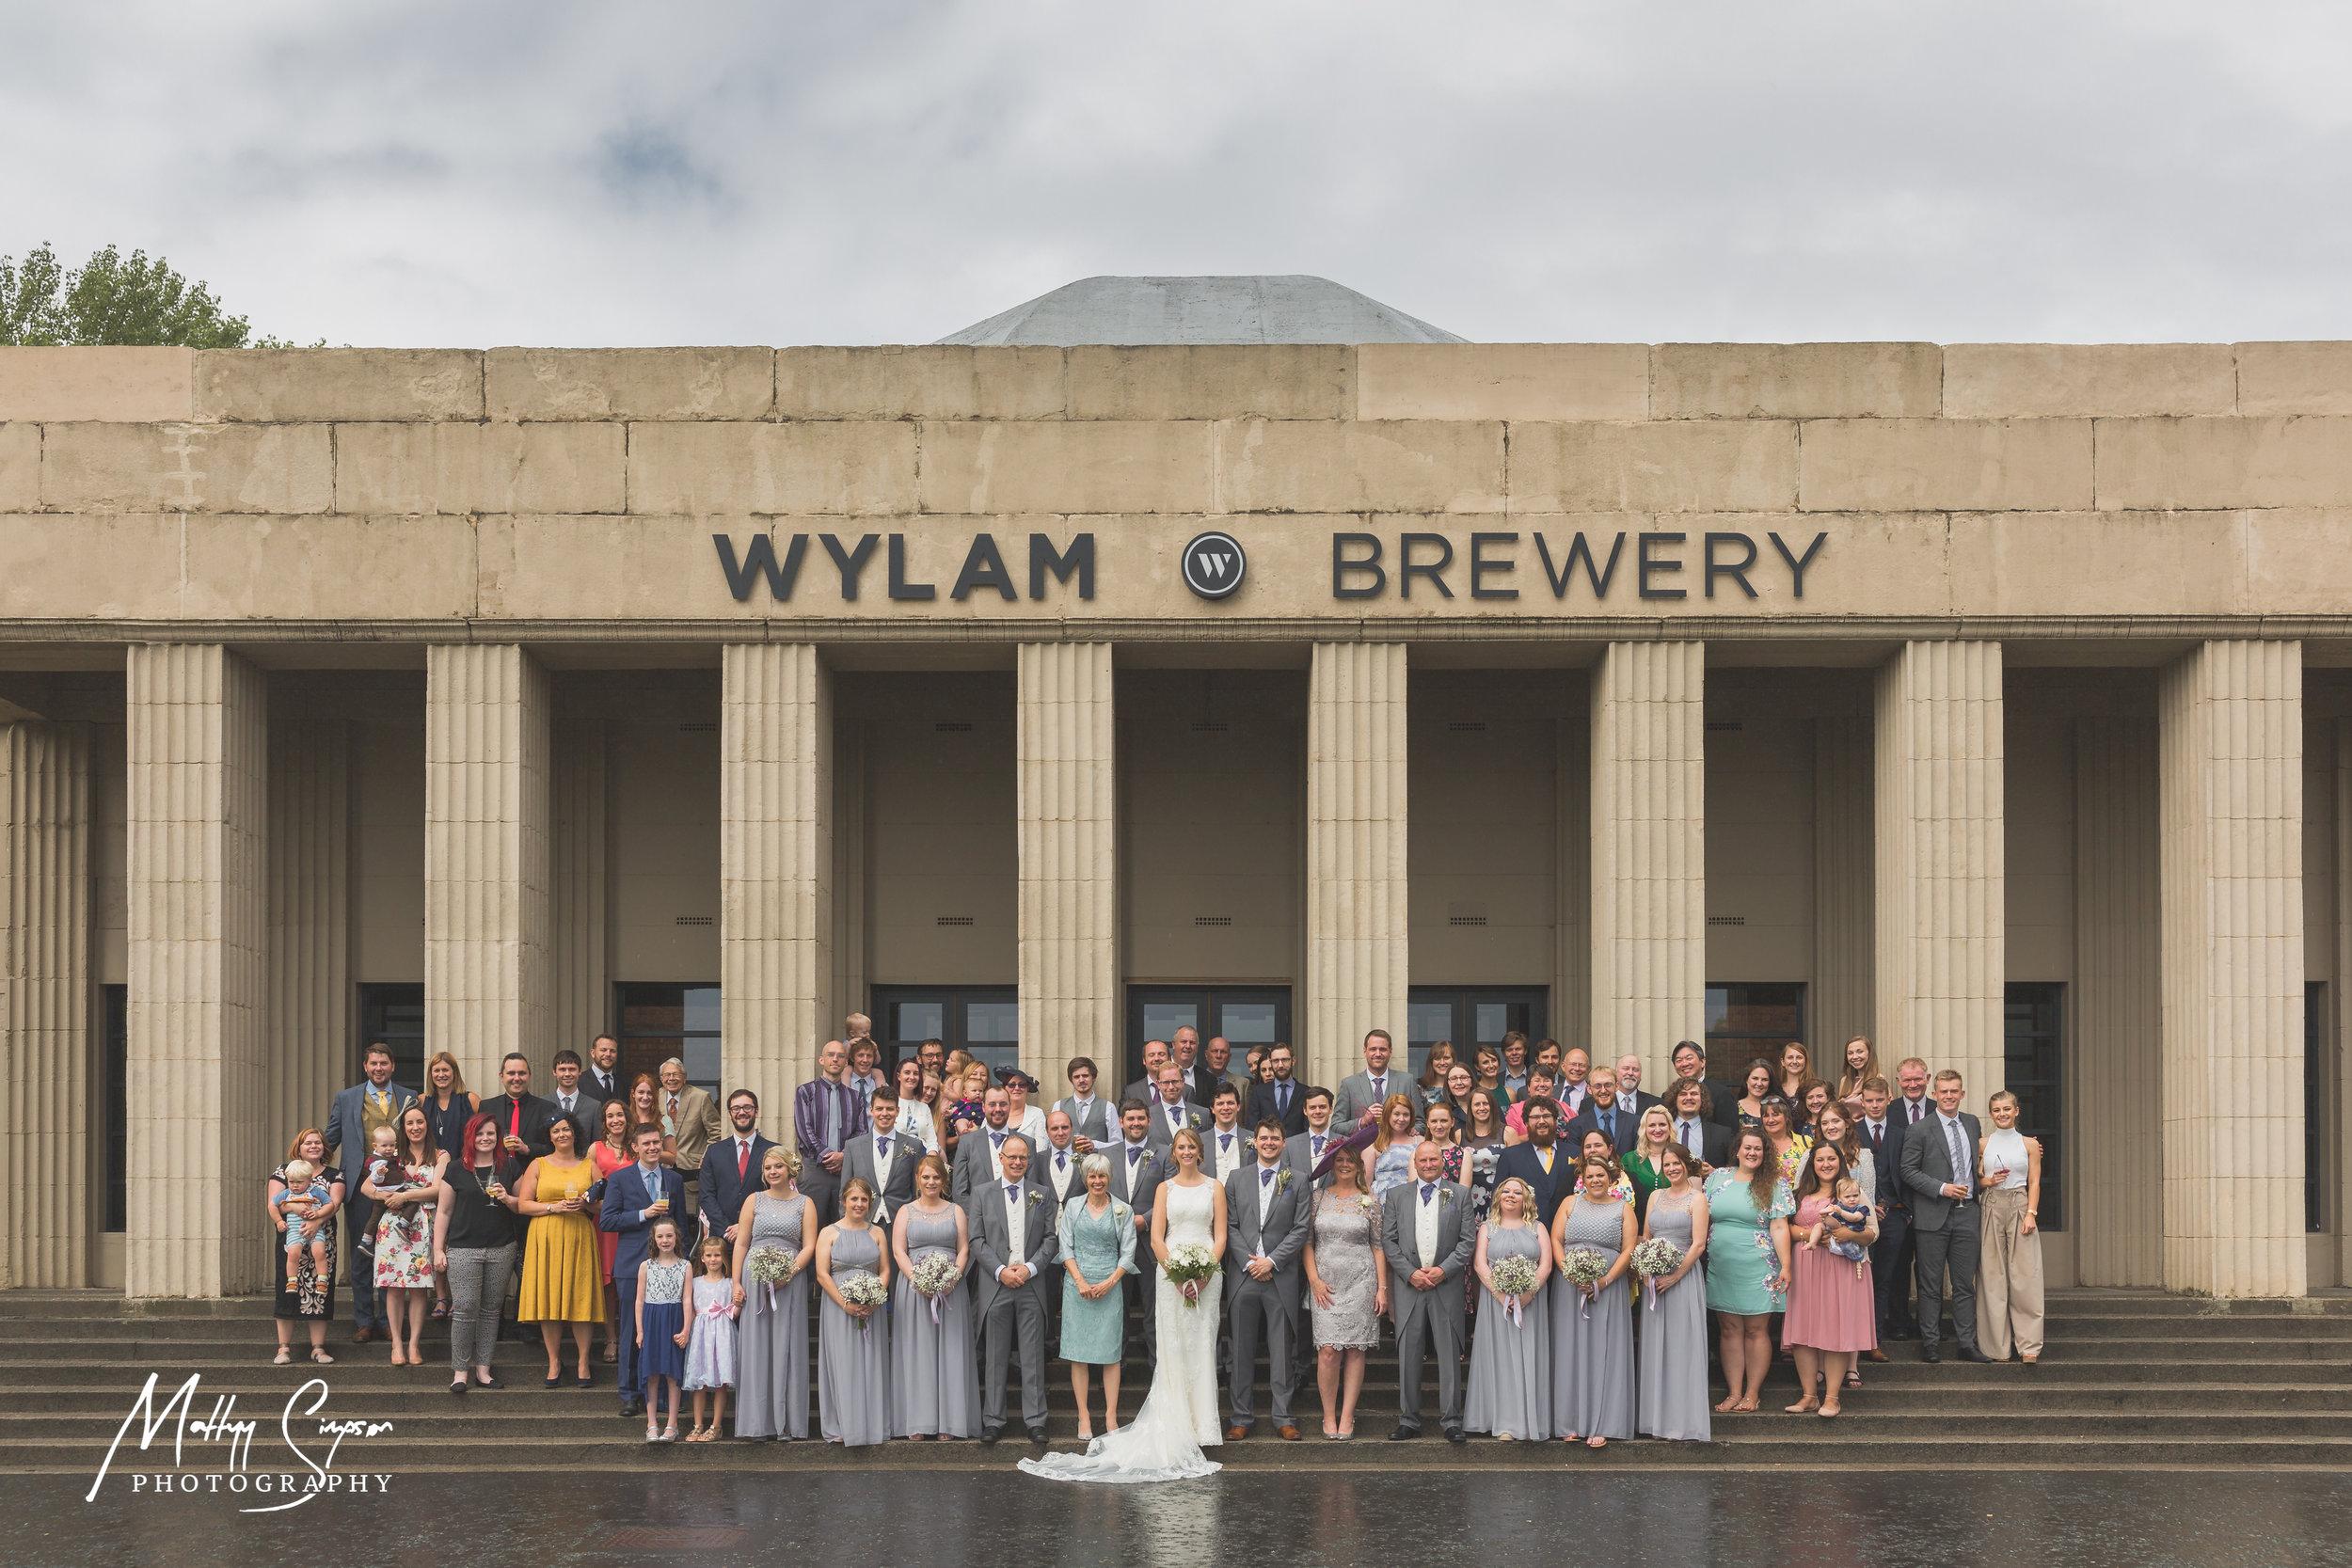 Wylam Brewery Wedding Group Photo